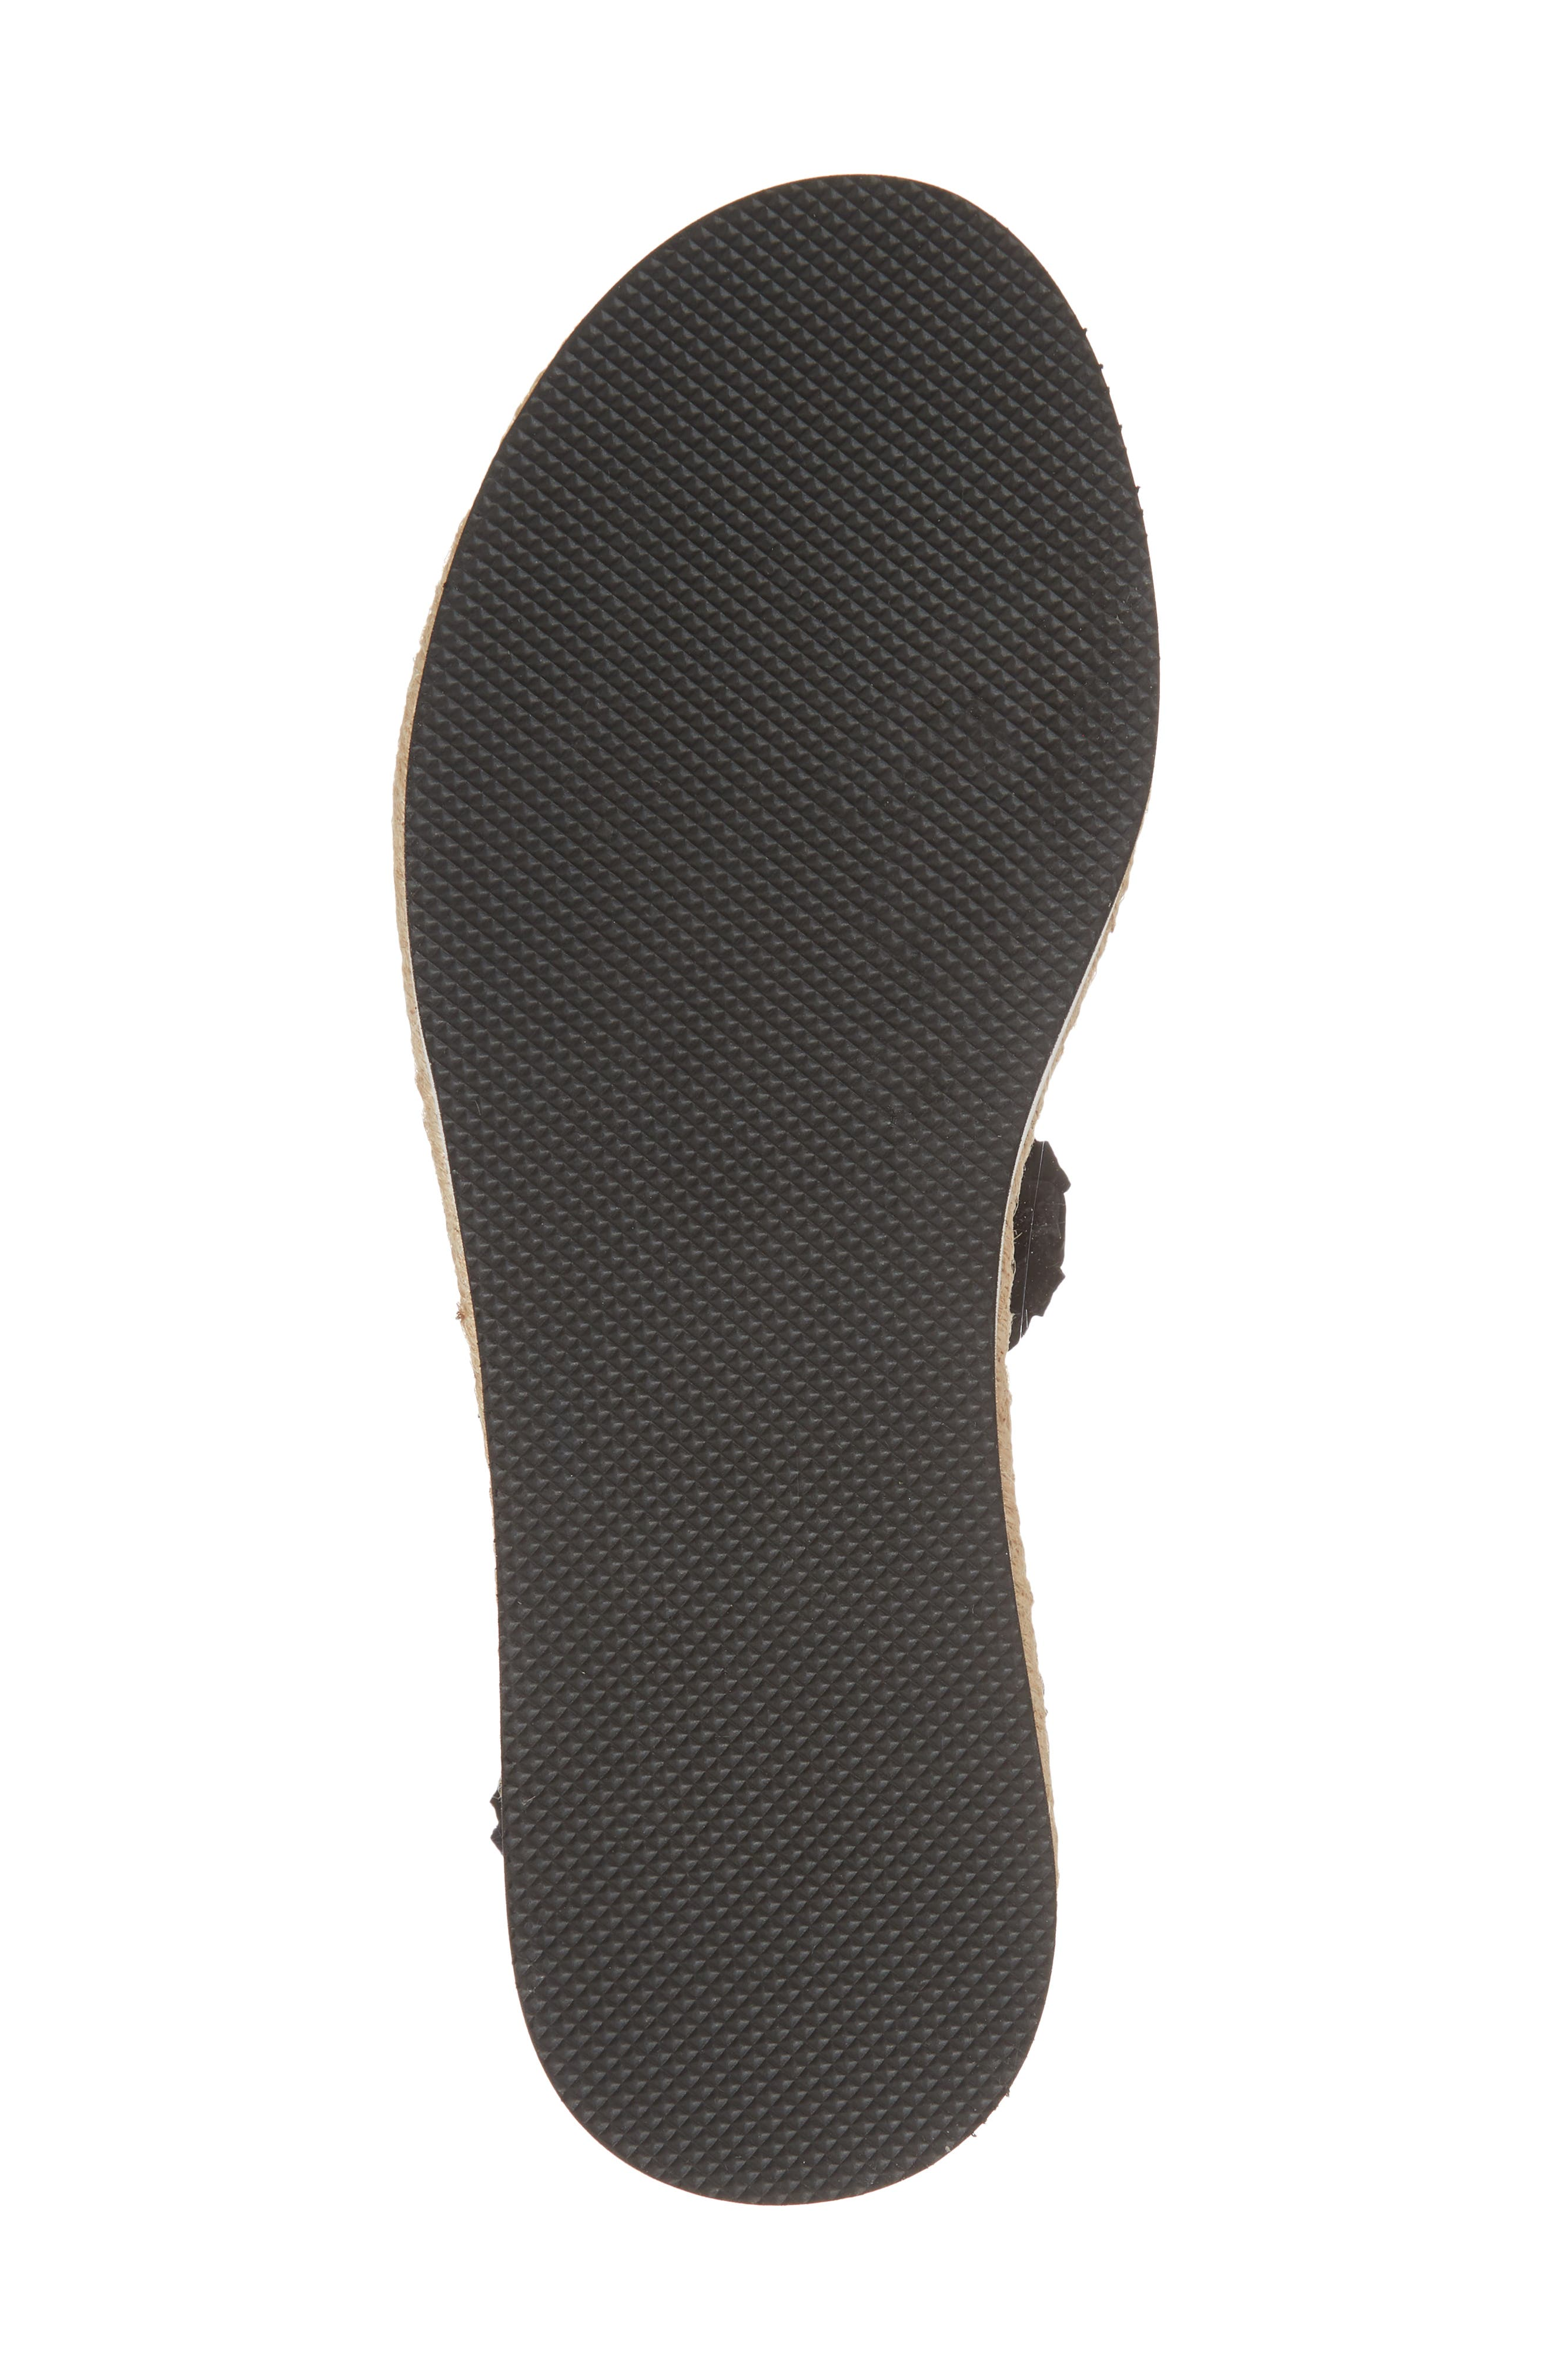 Nieve Braided Platform Sandal,                             Alternate thumbnail 6, color,                             001